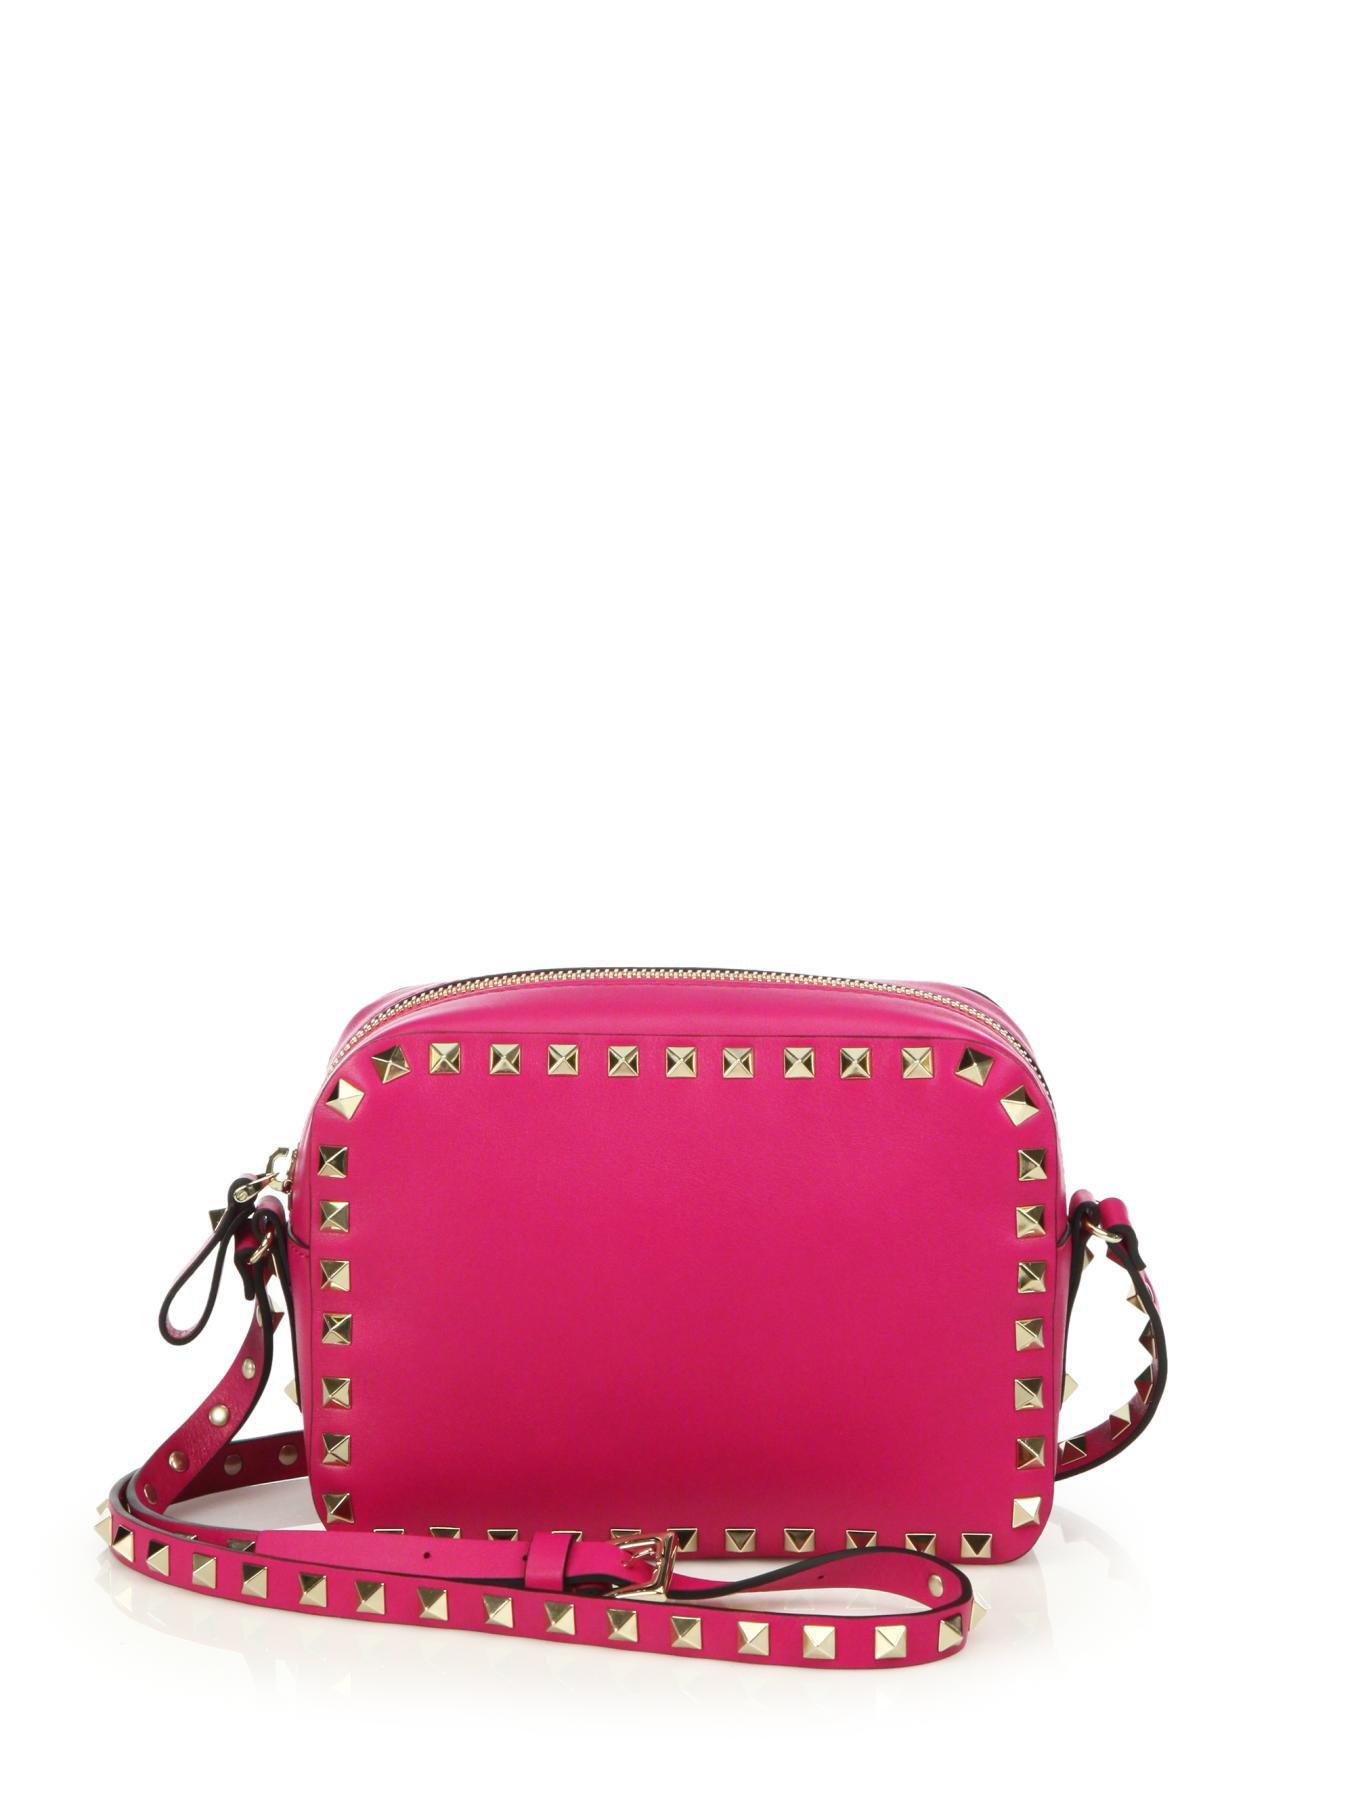 Valentino Rockstud Camera Bag in Pink  Lyst